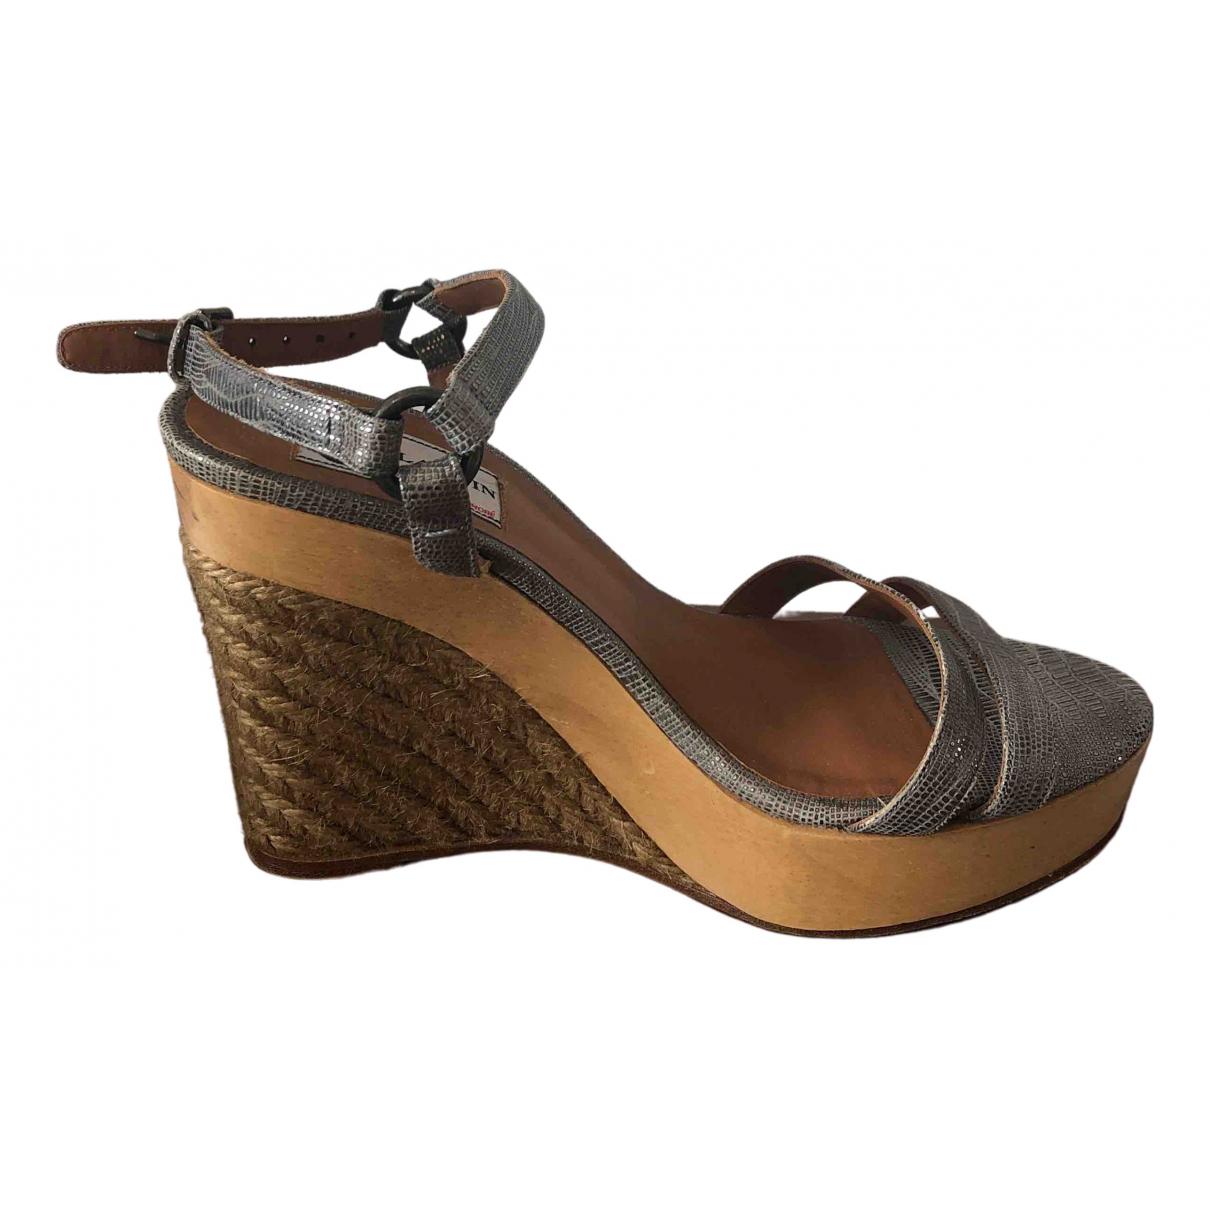 Lanvin \N Silver Leather Sandals for Women 37.5 EU